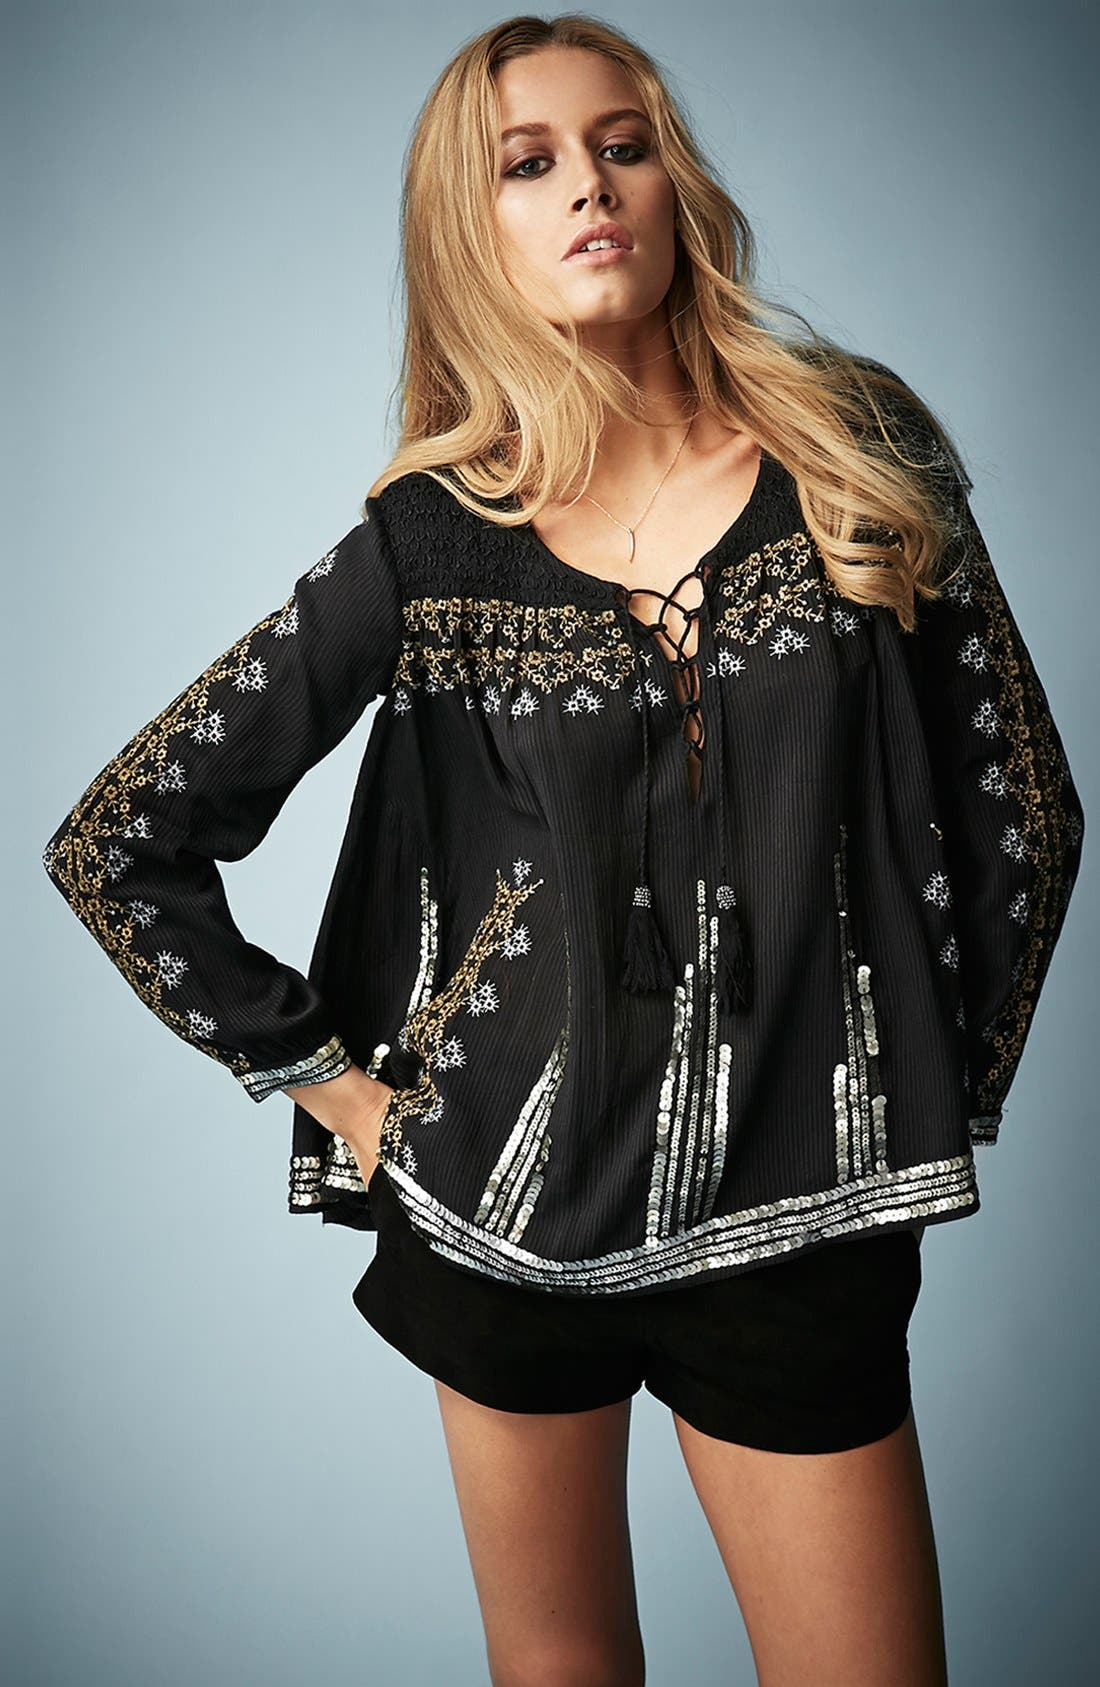 Main Image - Kate Moss for Topshop Folk Smocked Blouse